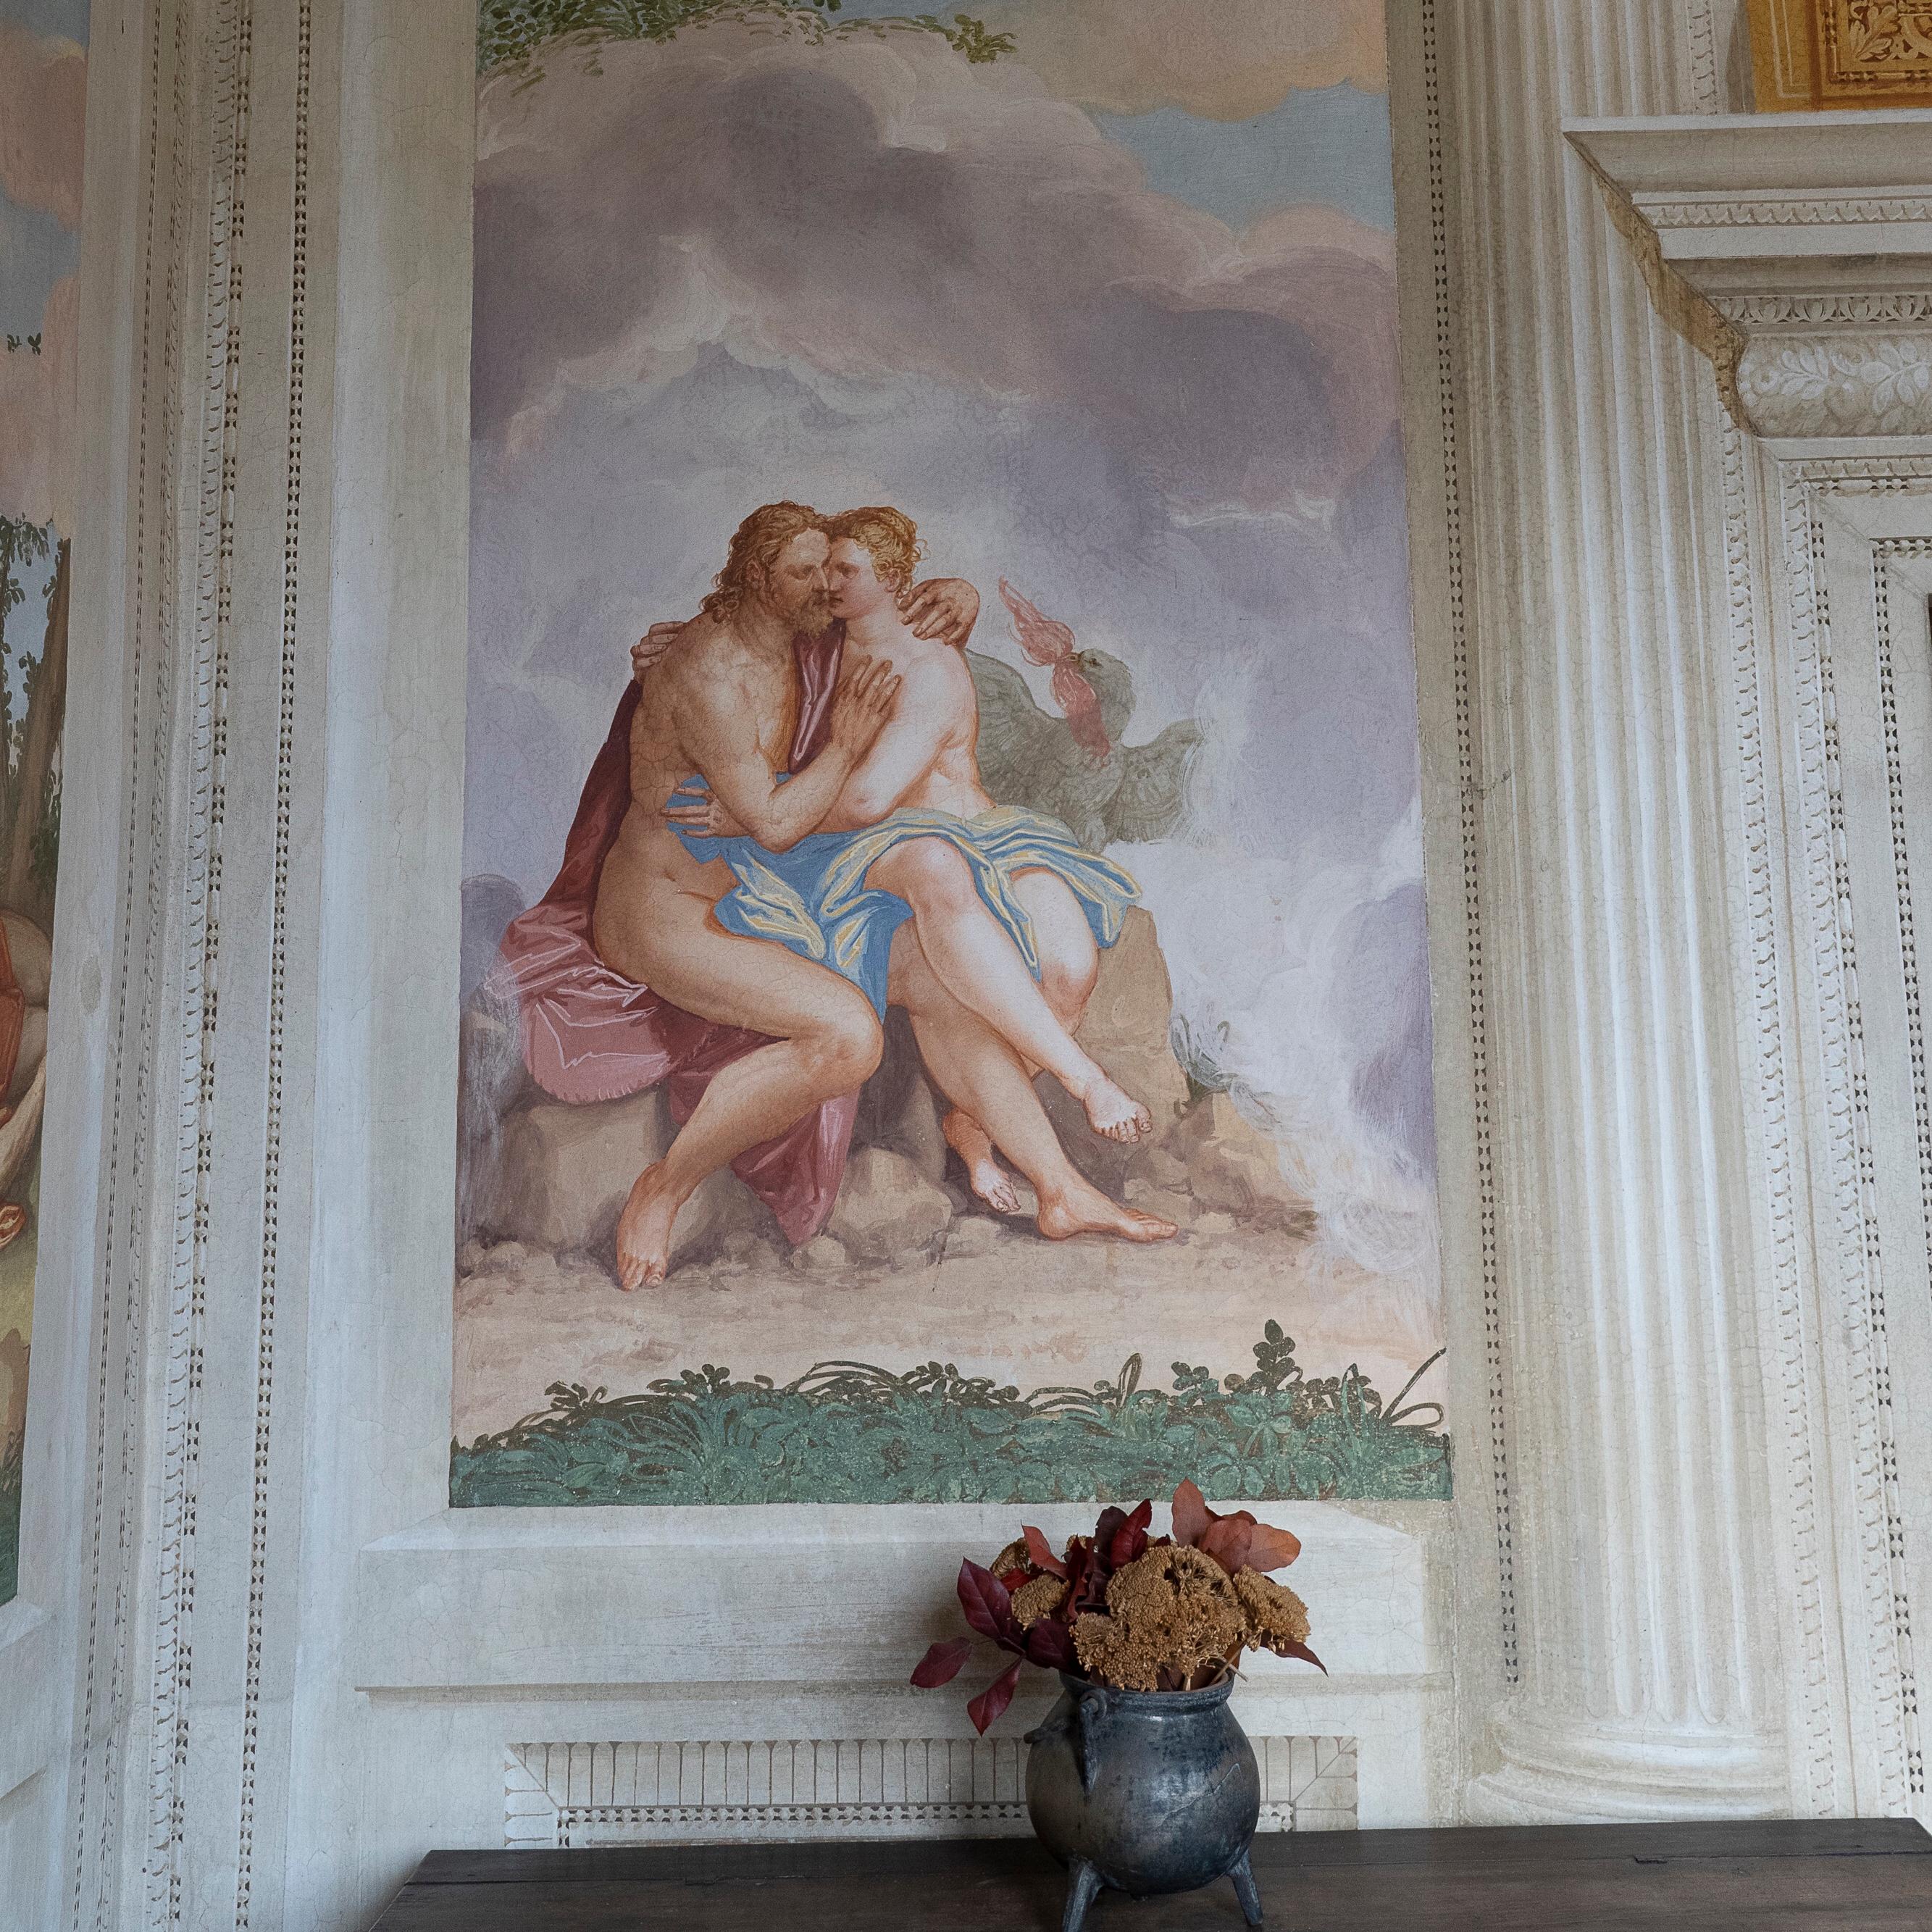 Jupiter and Io - fresco by Zelotti, 16th century - Villa Emo, Fanzolo, Veneto, Italy